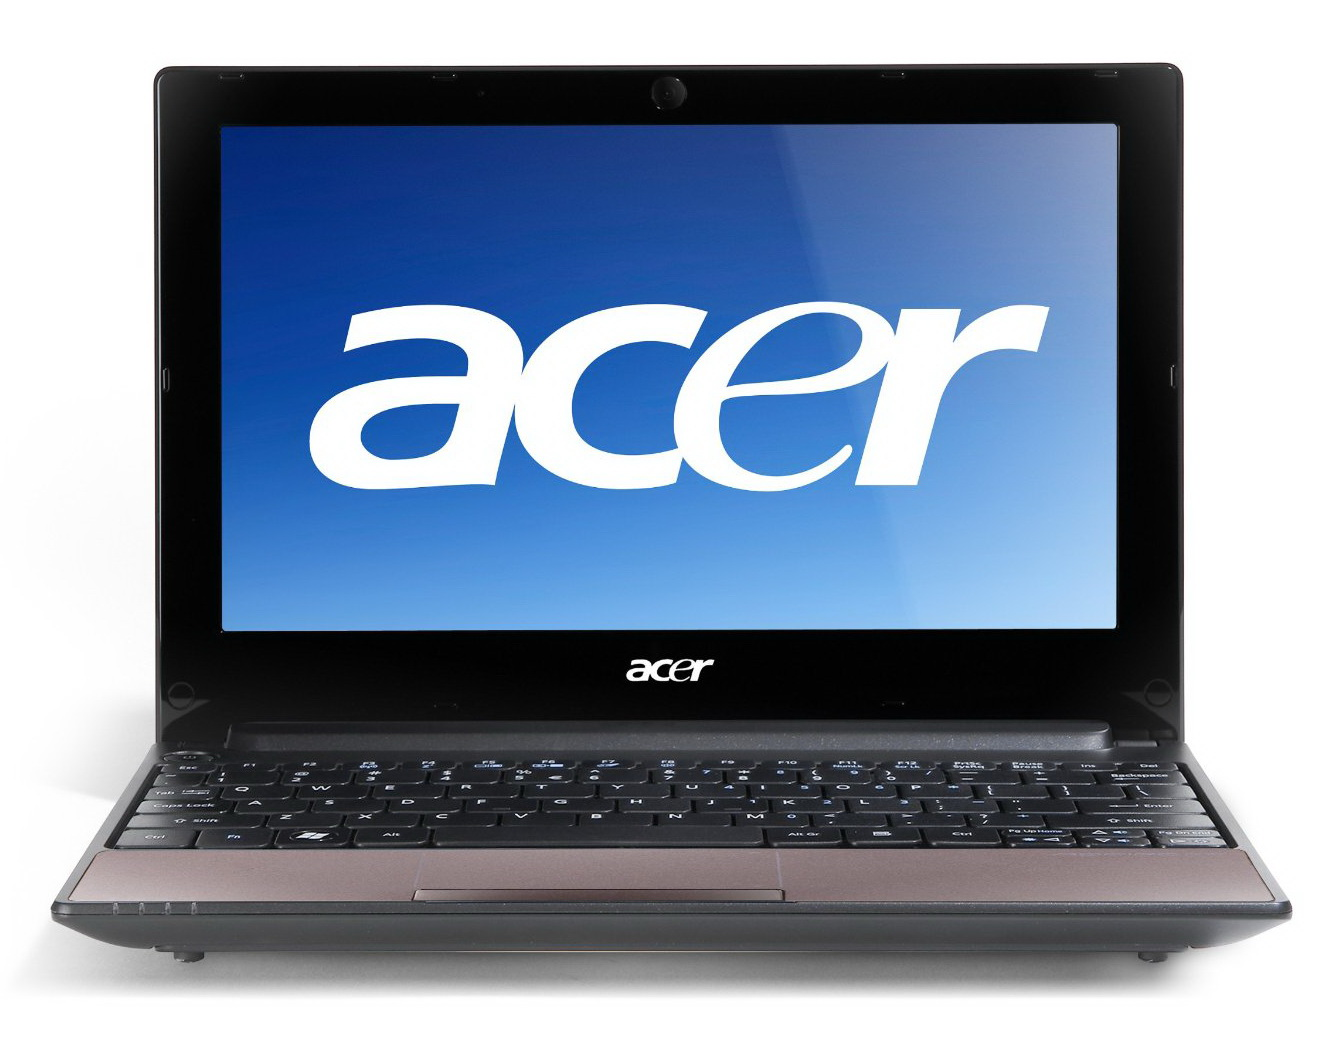 ACER ASPIRE ONE 751H NETBOOK LITEON CAMERA DRIVER WINDOWS 7 (2019)